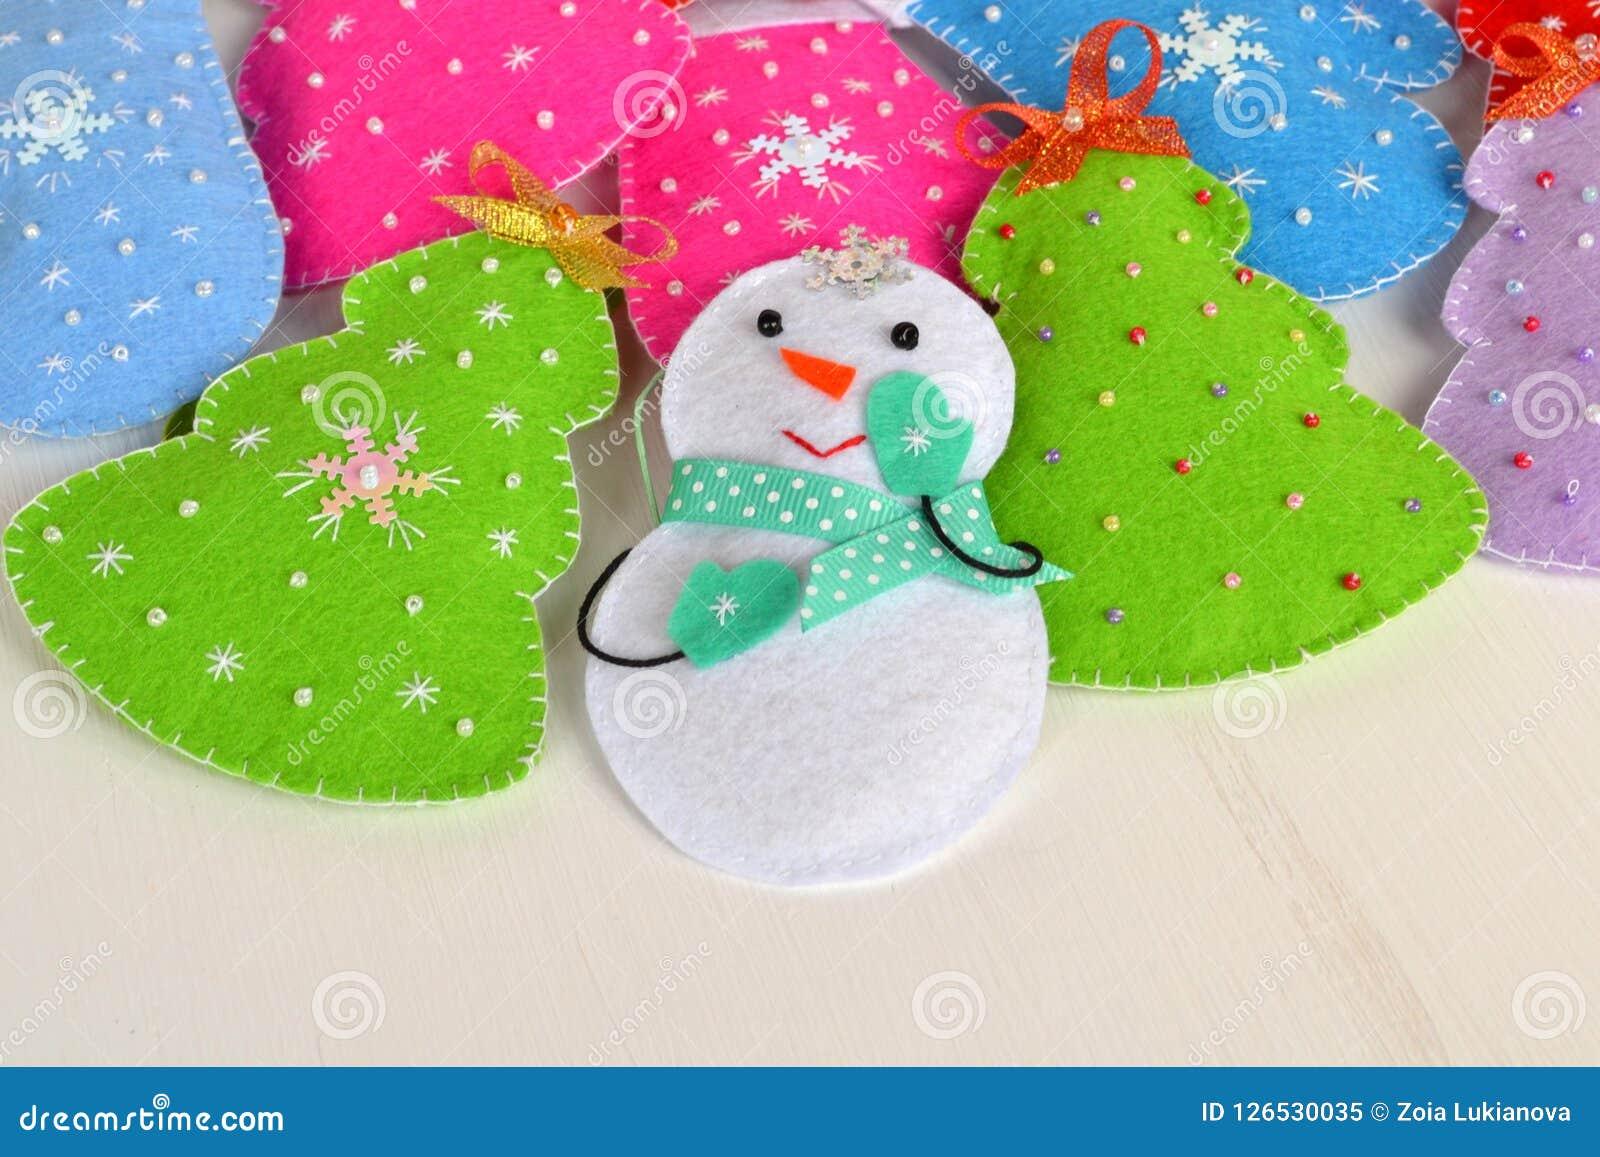 Handmade Felt Christmas Toys Handmade Kids Craft Stock